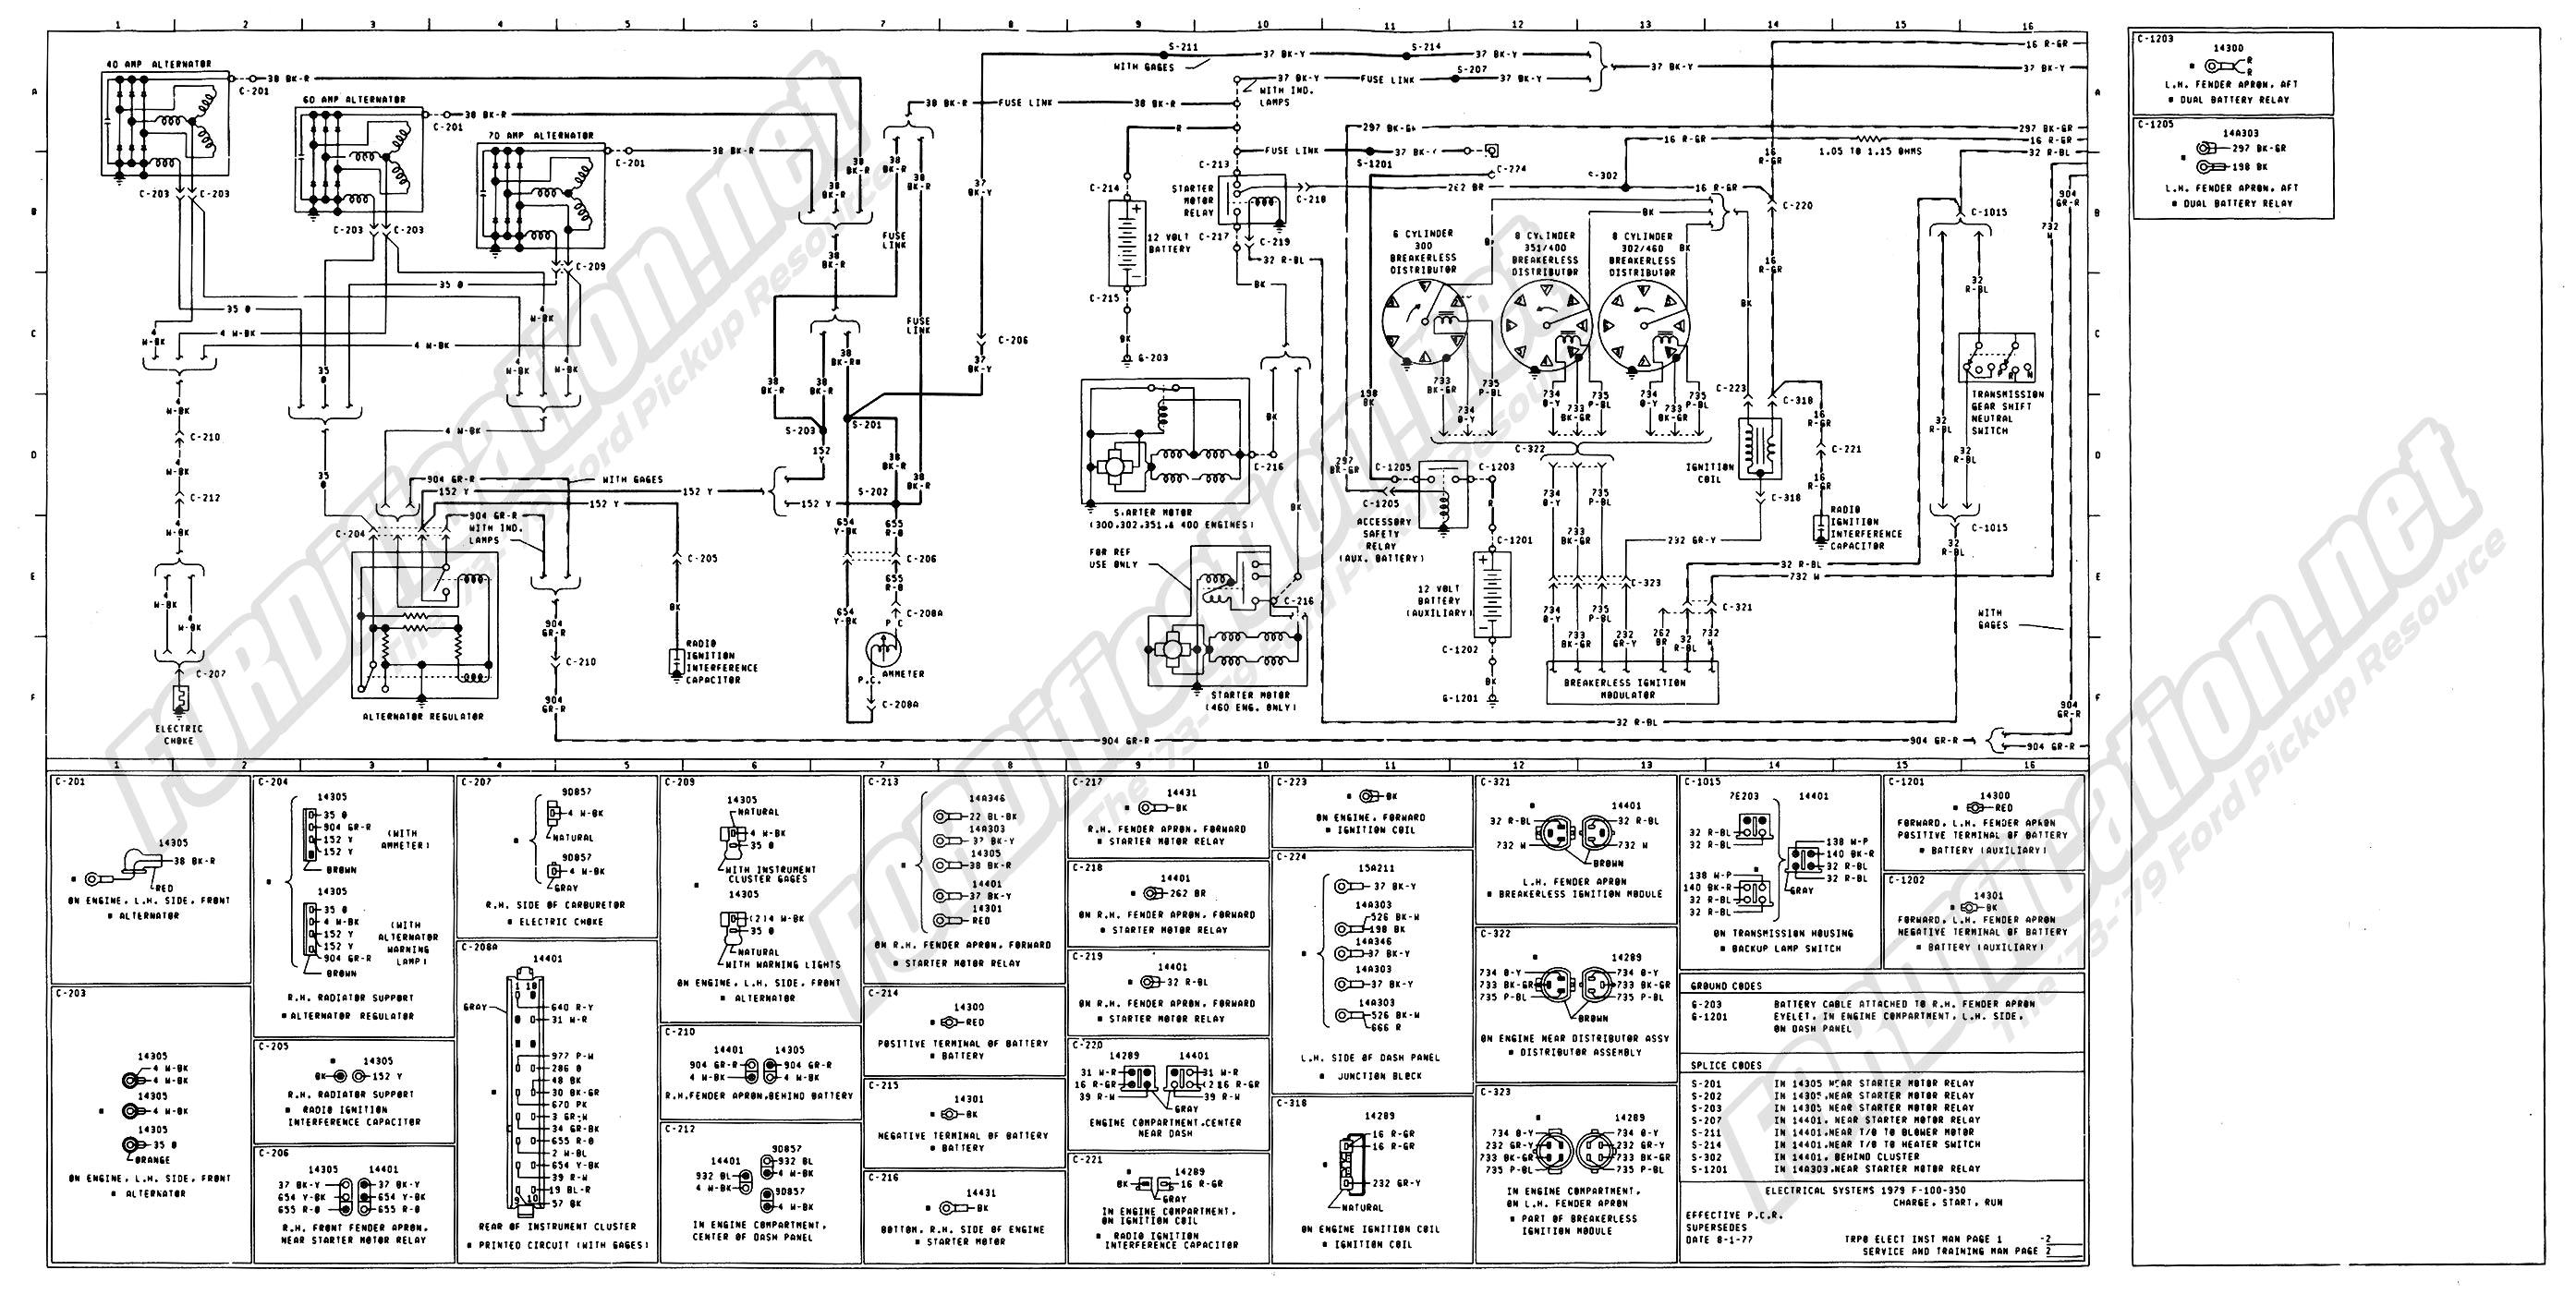 1977 ford econoline wiring diagram